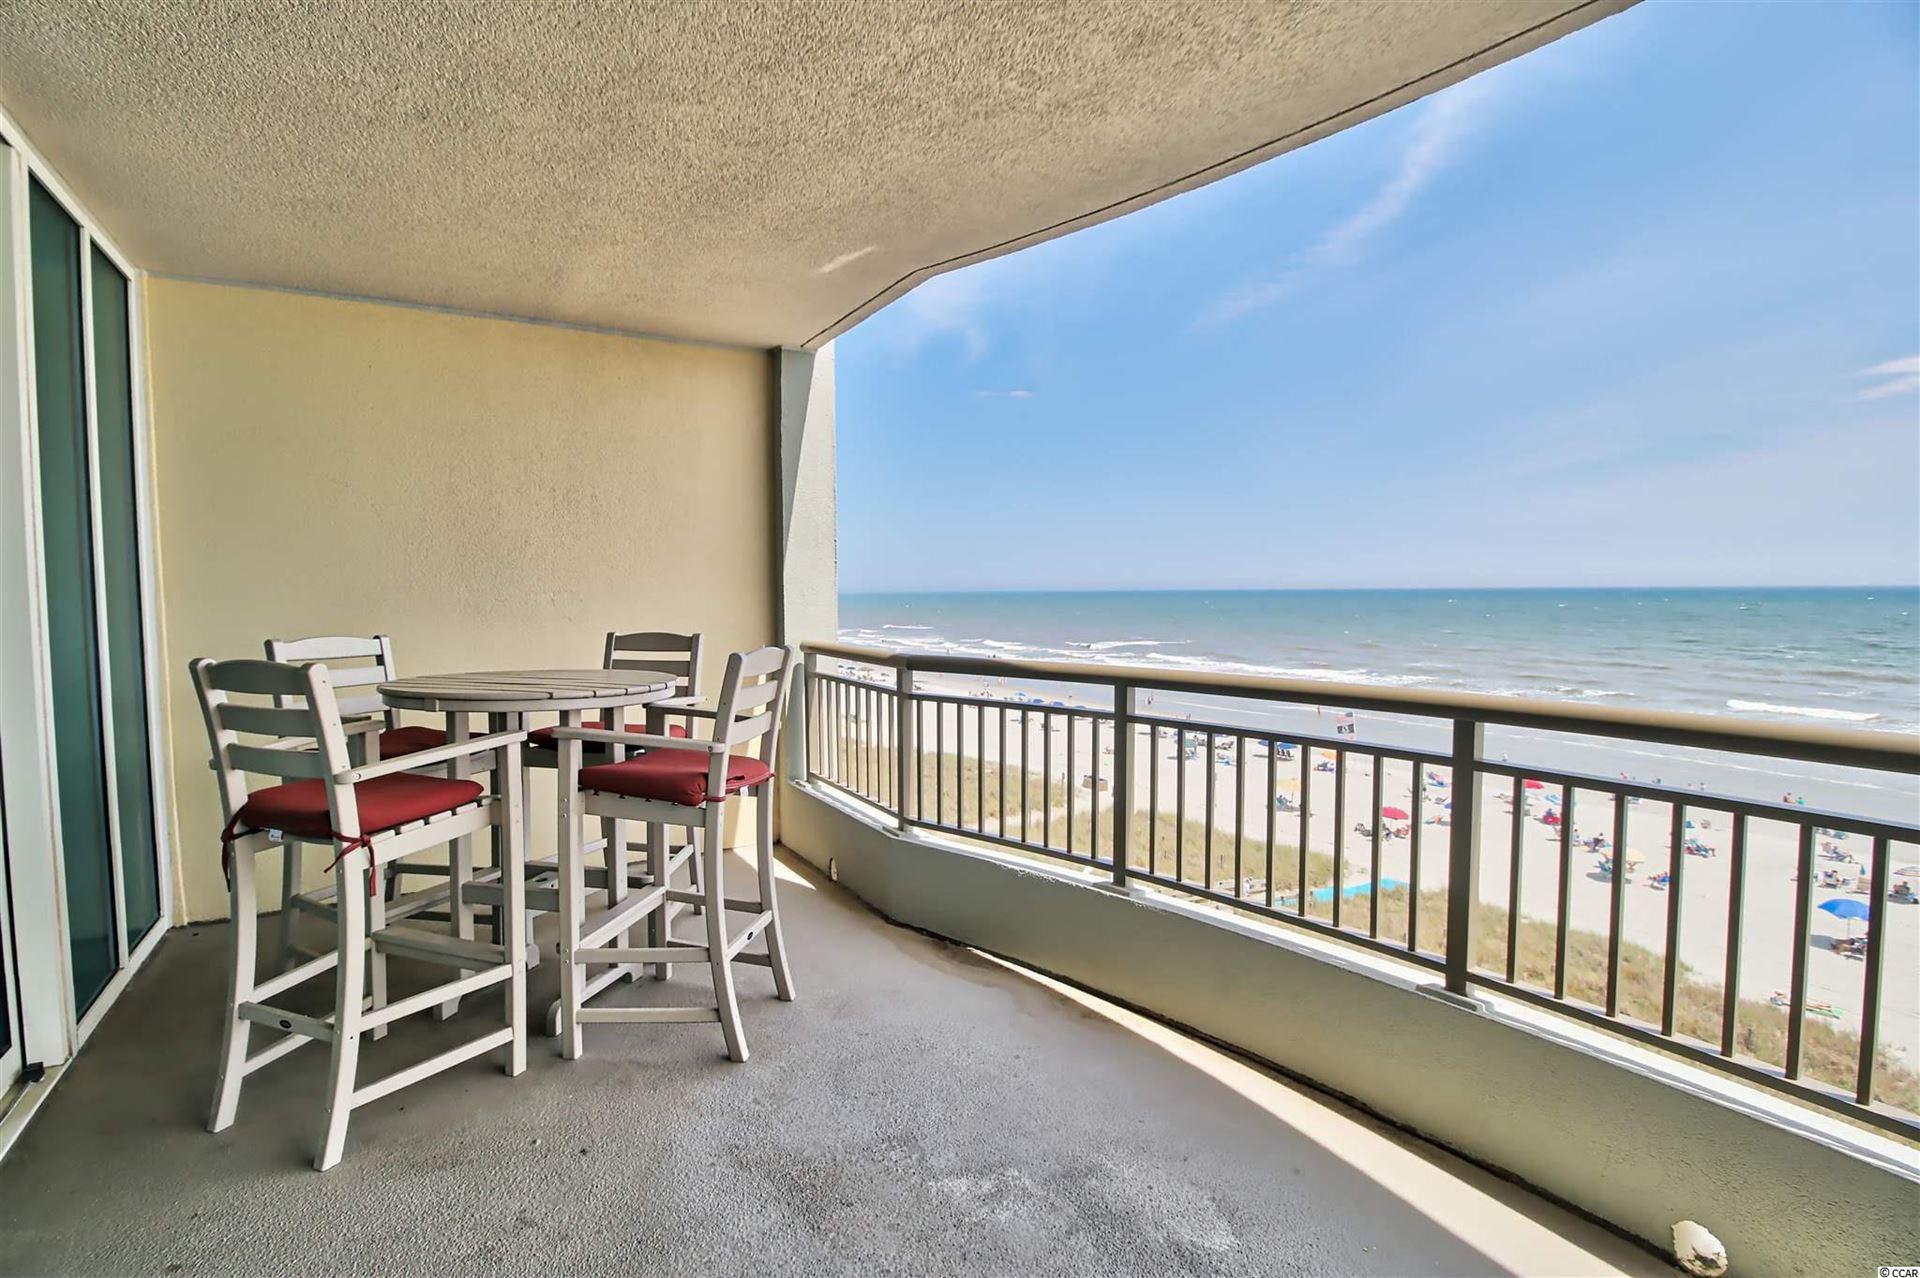 603 Ocean Blvd. S, North Myrtle Beach, SC, 29582, Mar Vista Grande Resort Home For Sale